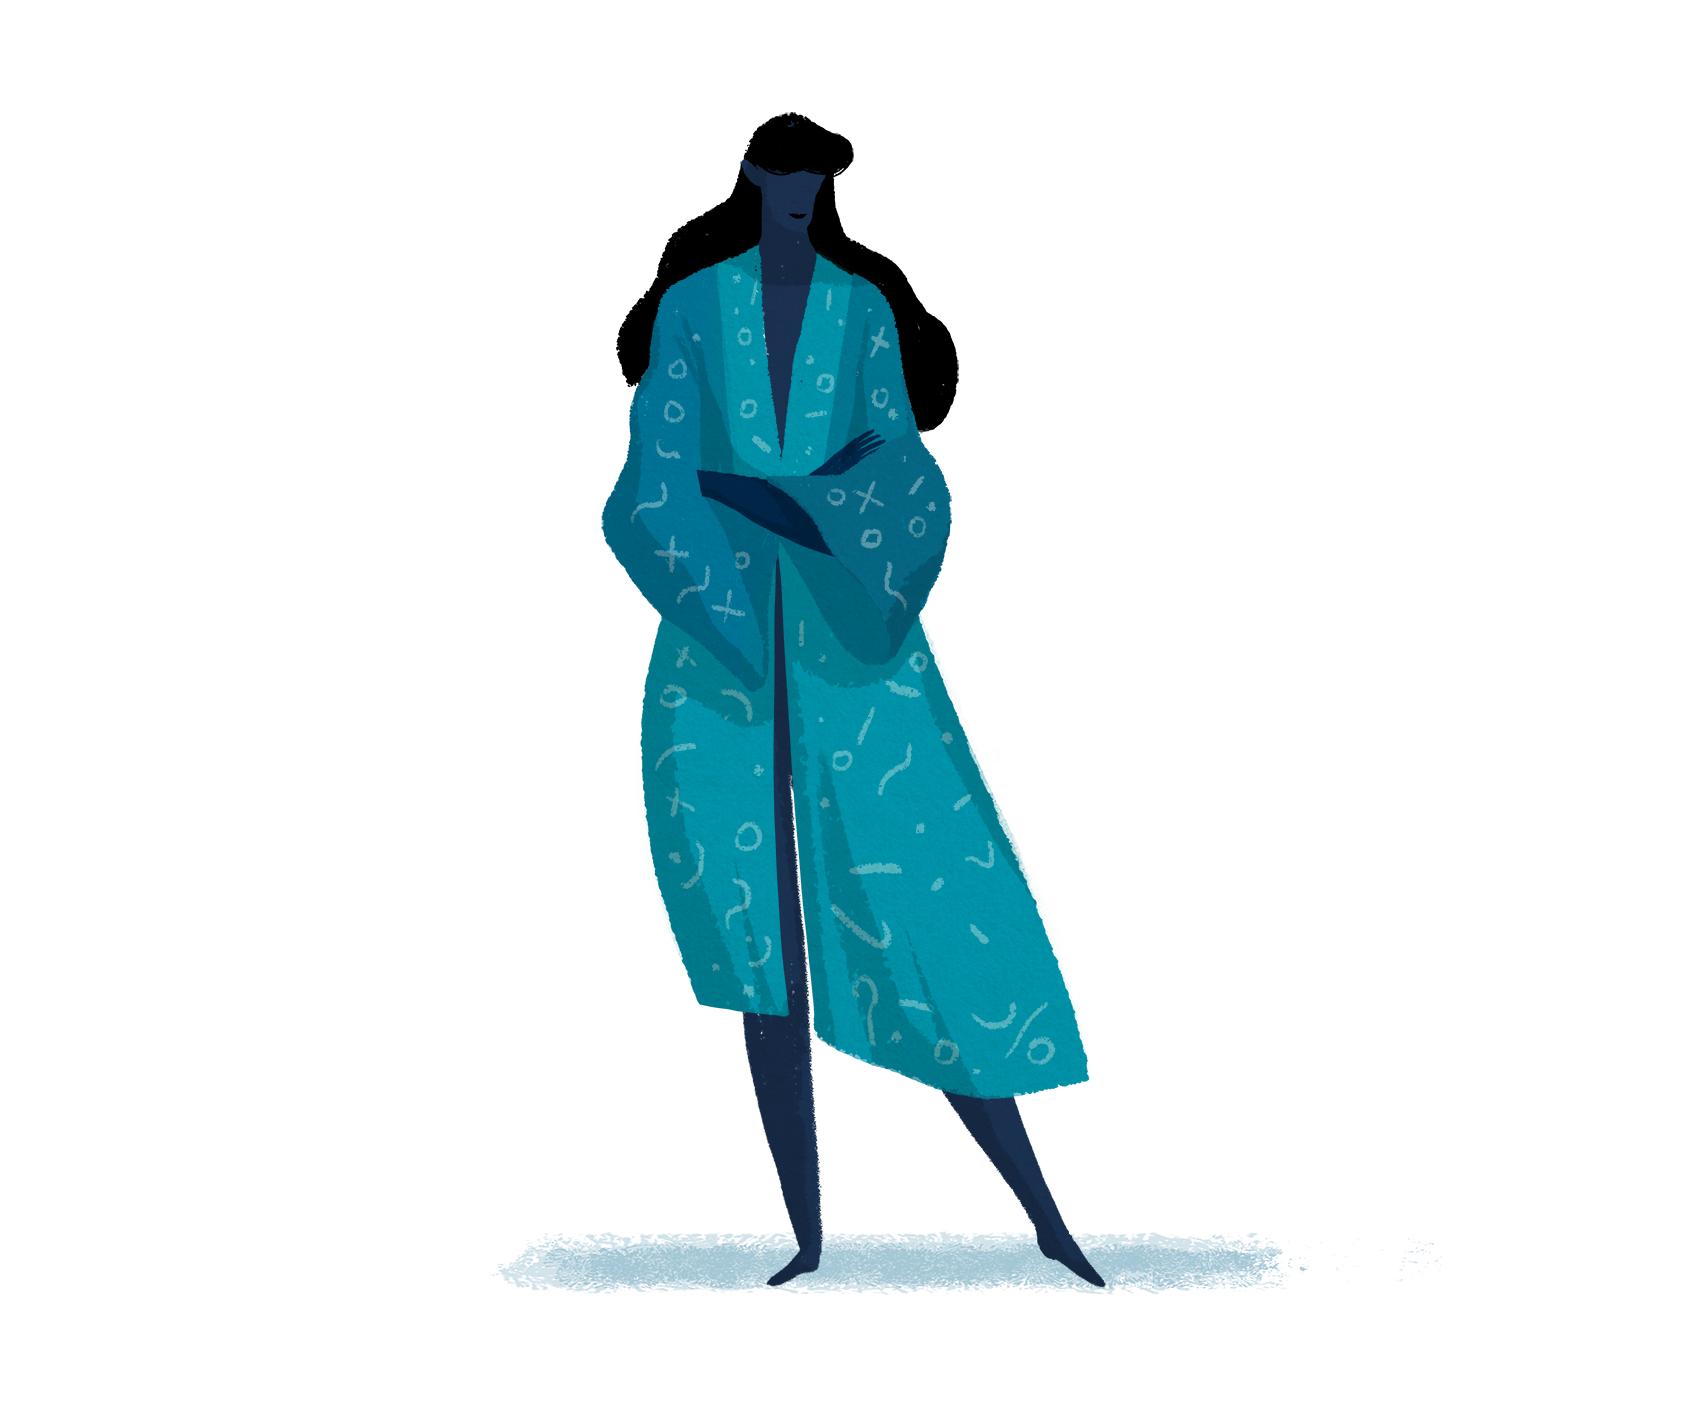 0714_illustration_lady_1700.png